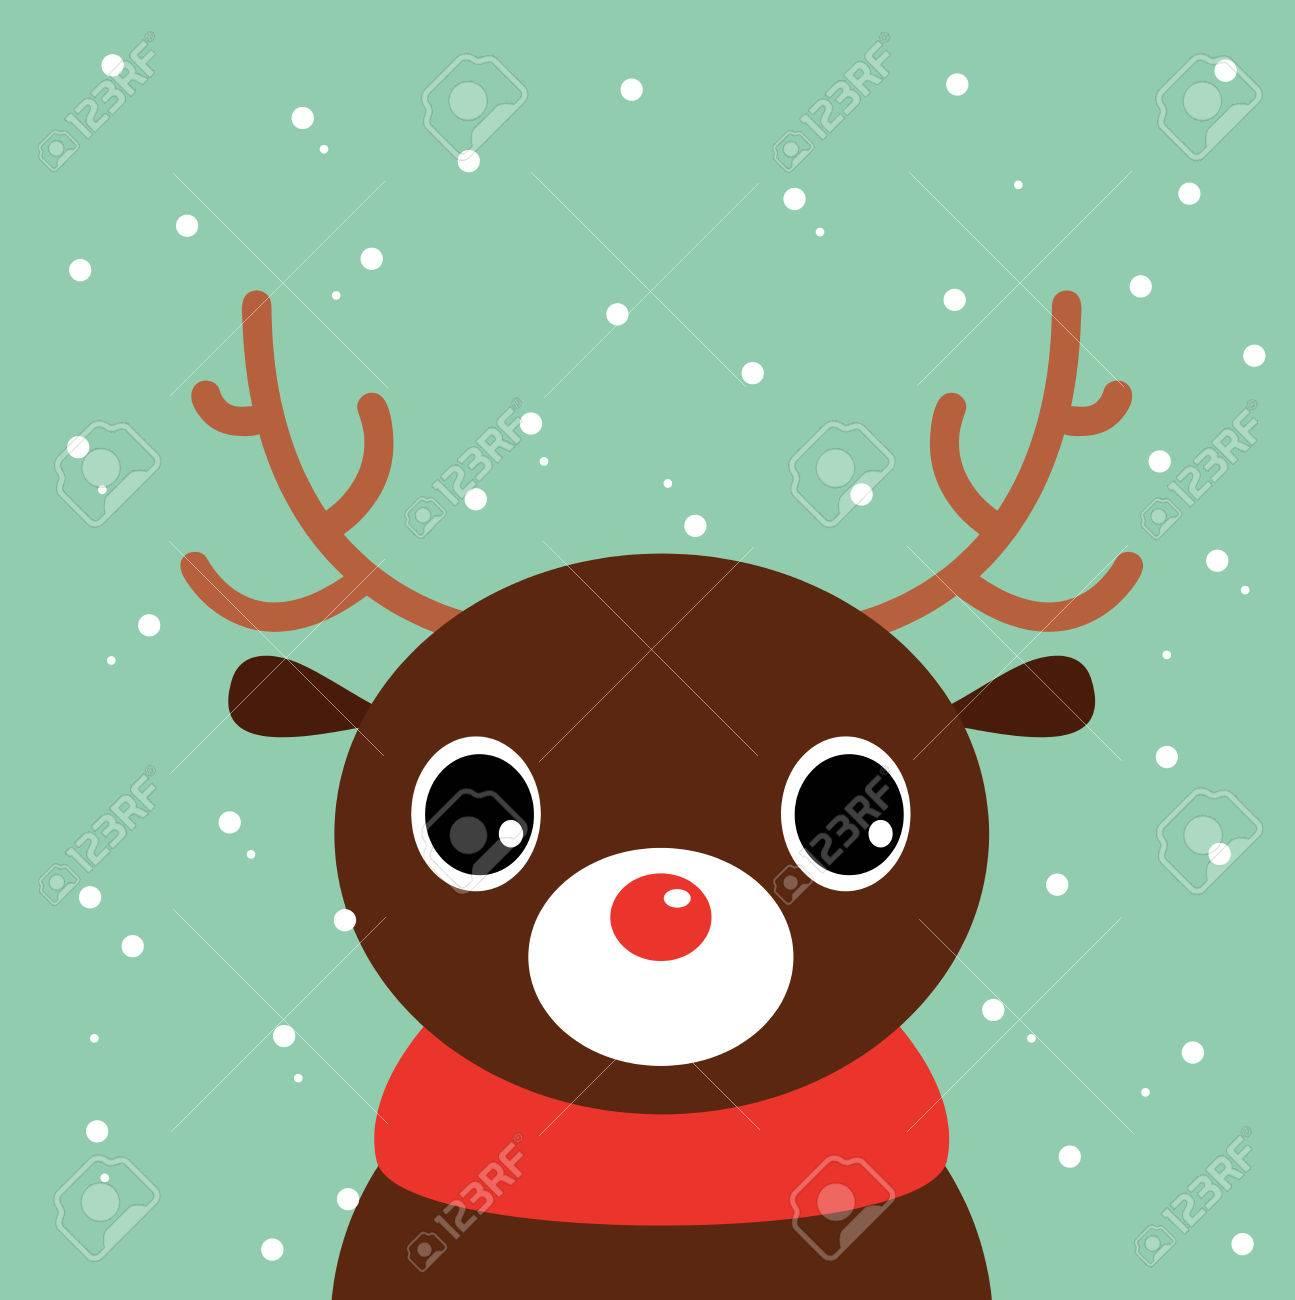 Beautiful Cute Xmas Deer Illustration Royalty Free Cliparts, Vectors ...